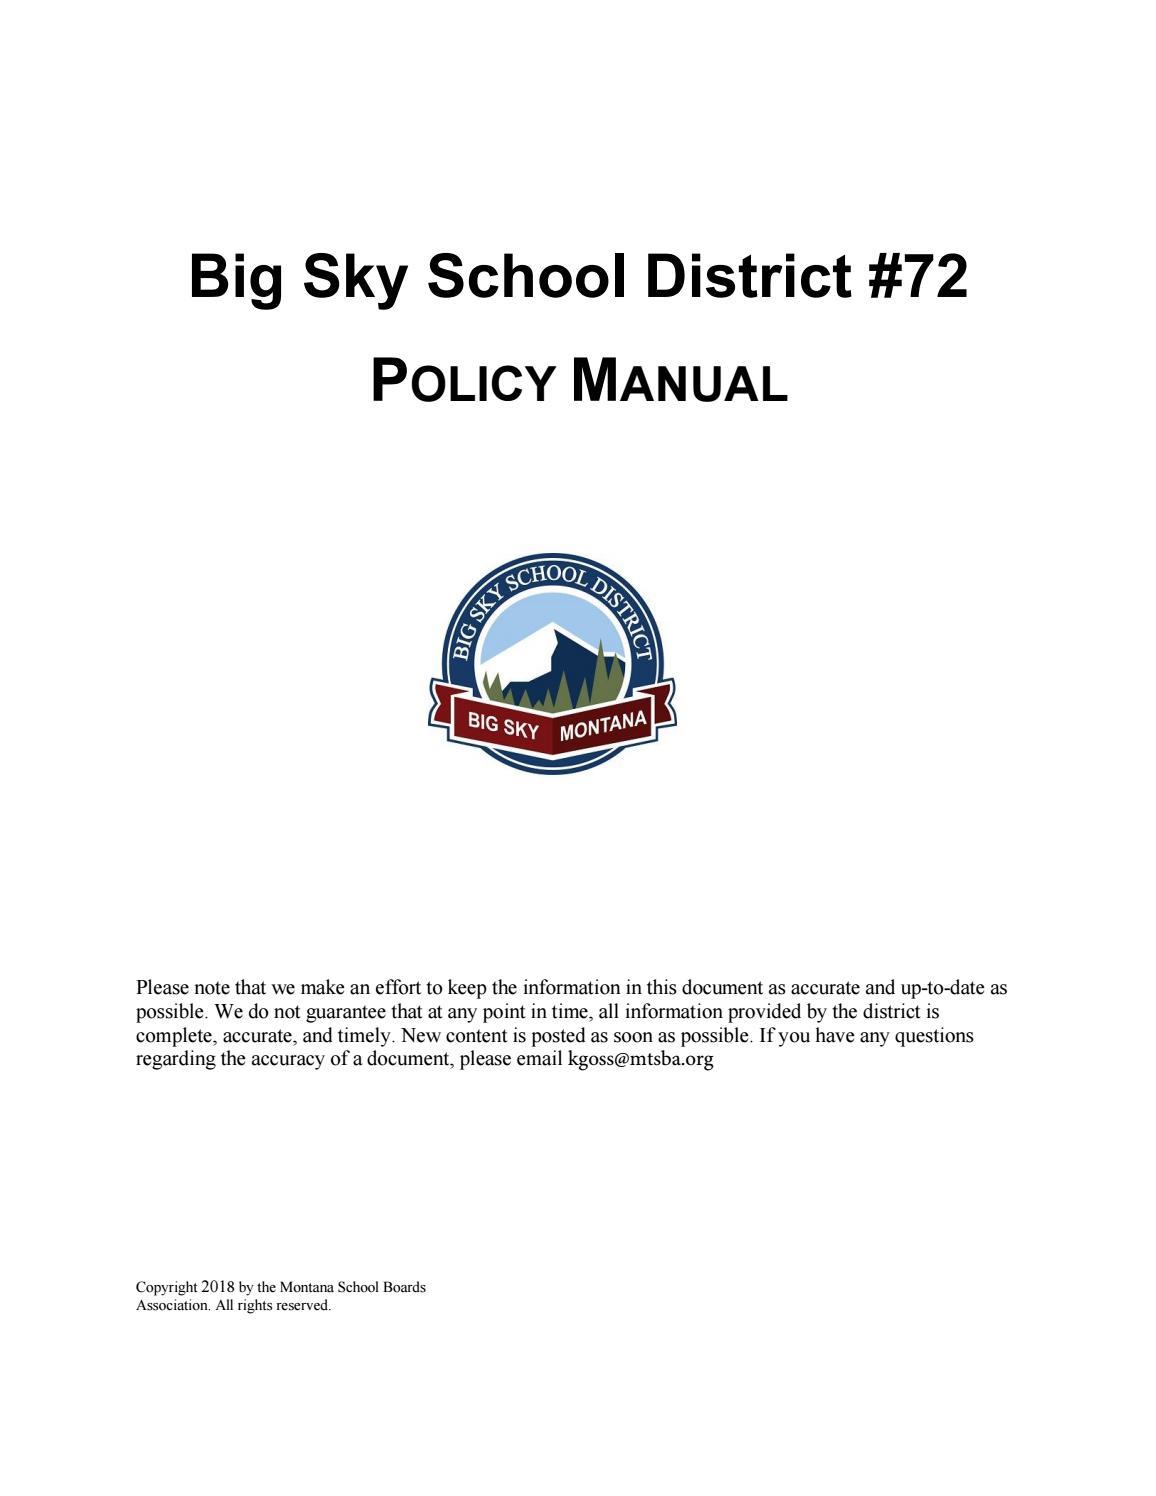 aced9ff77 Big Sky School District #72 Policy Manual by Montana School Boards  Association - issuu